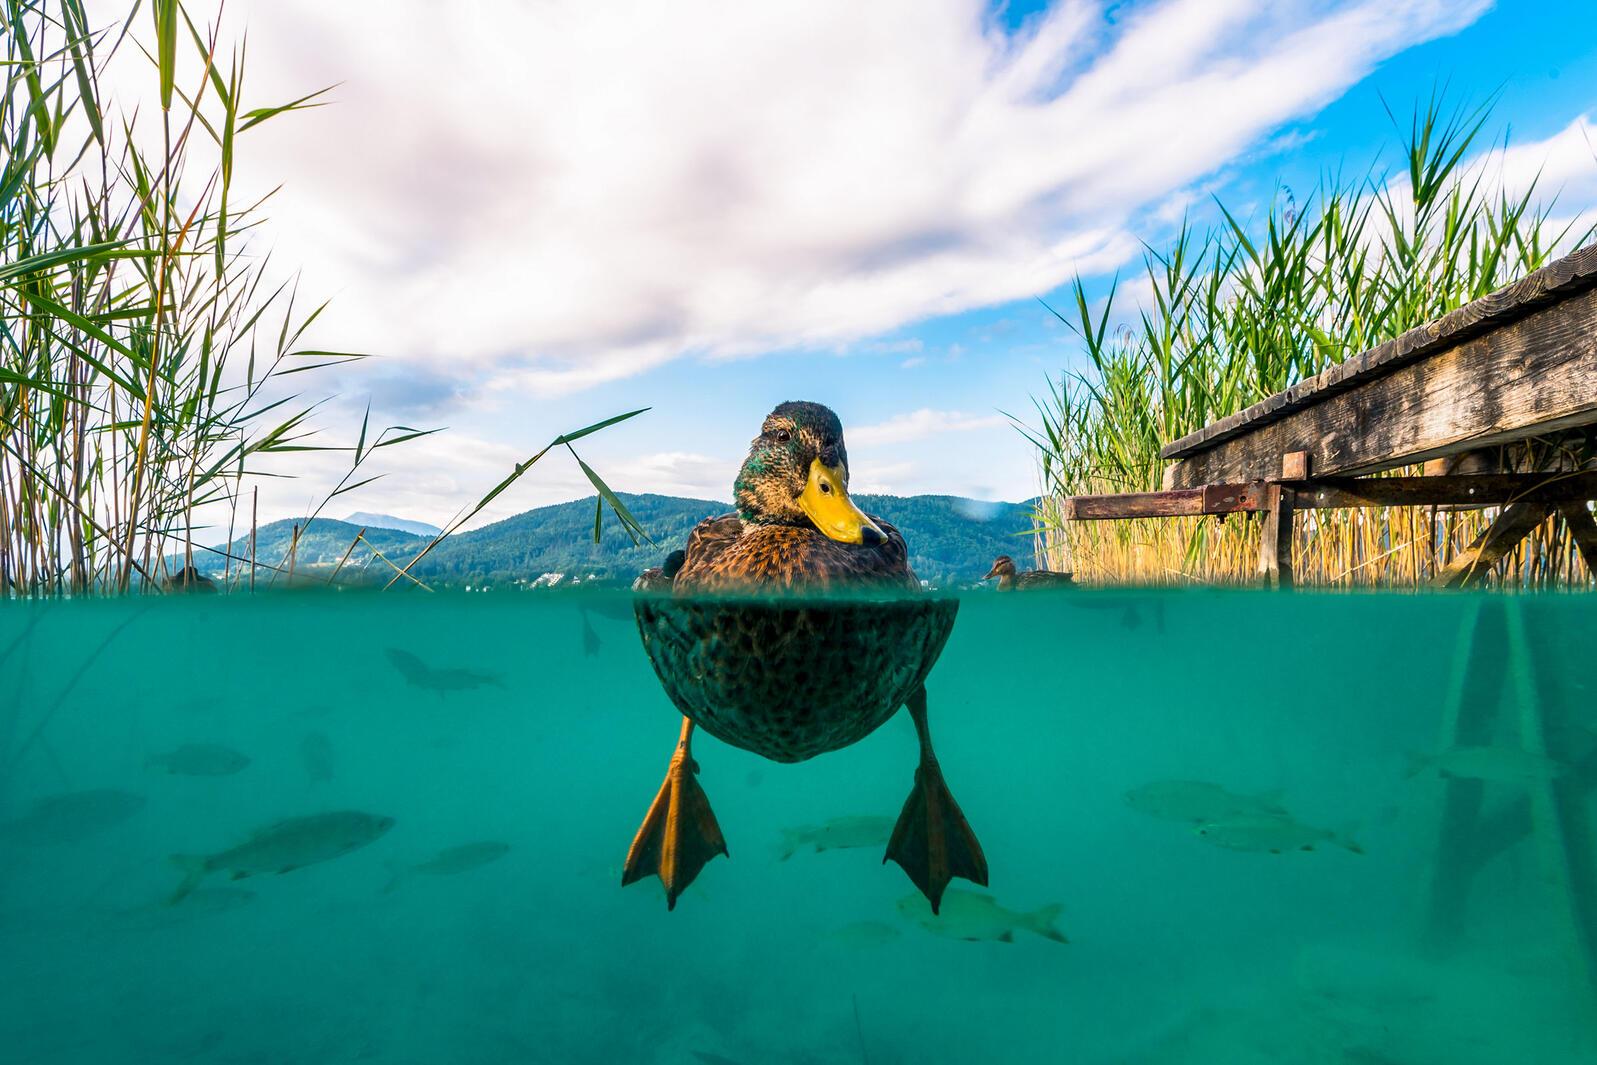 Mallard. Michael Stabentheiner/Audubon Photography Awards